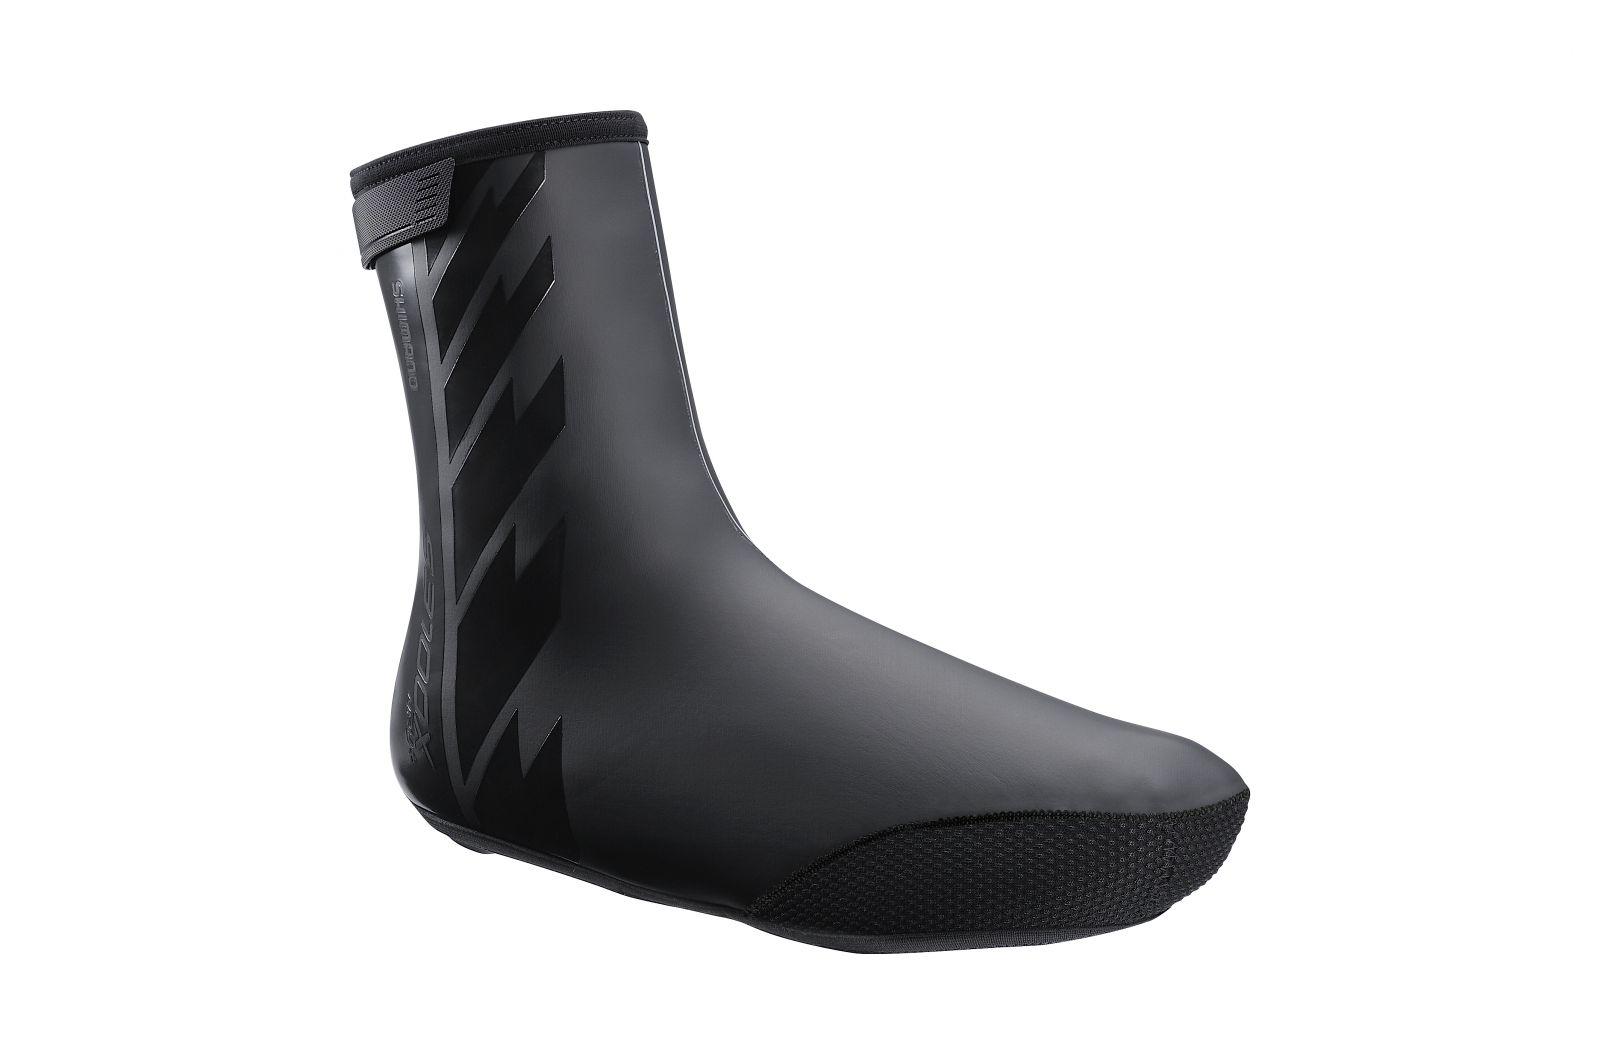 SHIMANO S3100X NPU+ návleky na obuv, černá, M